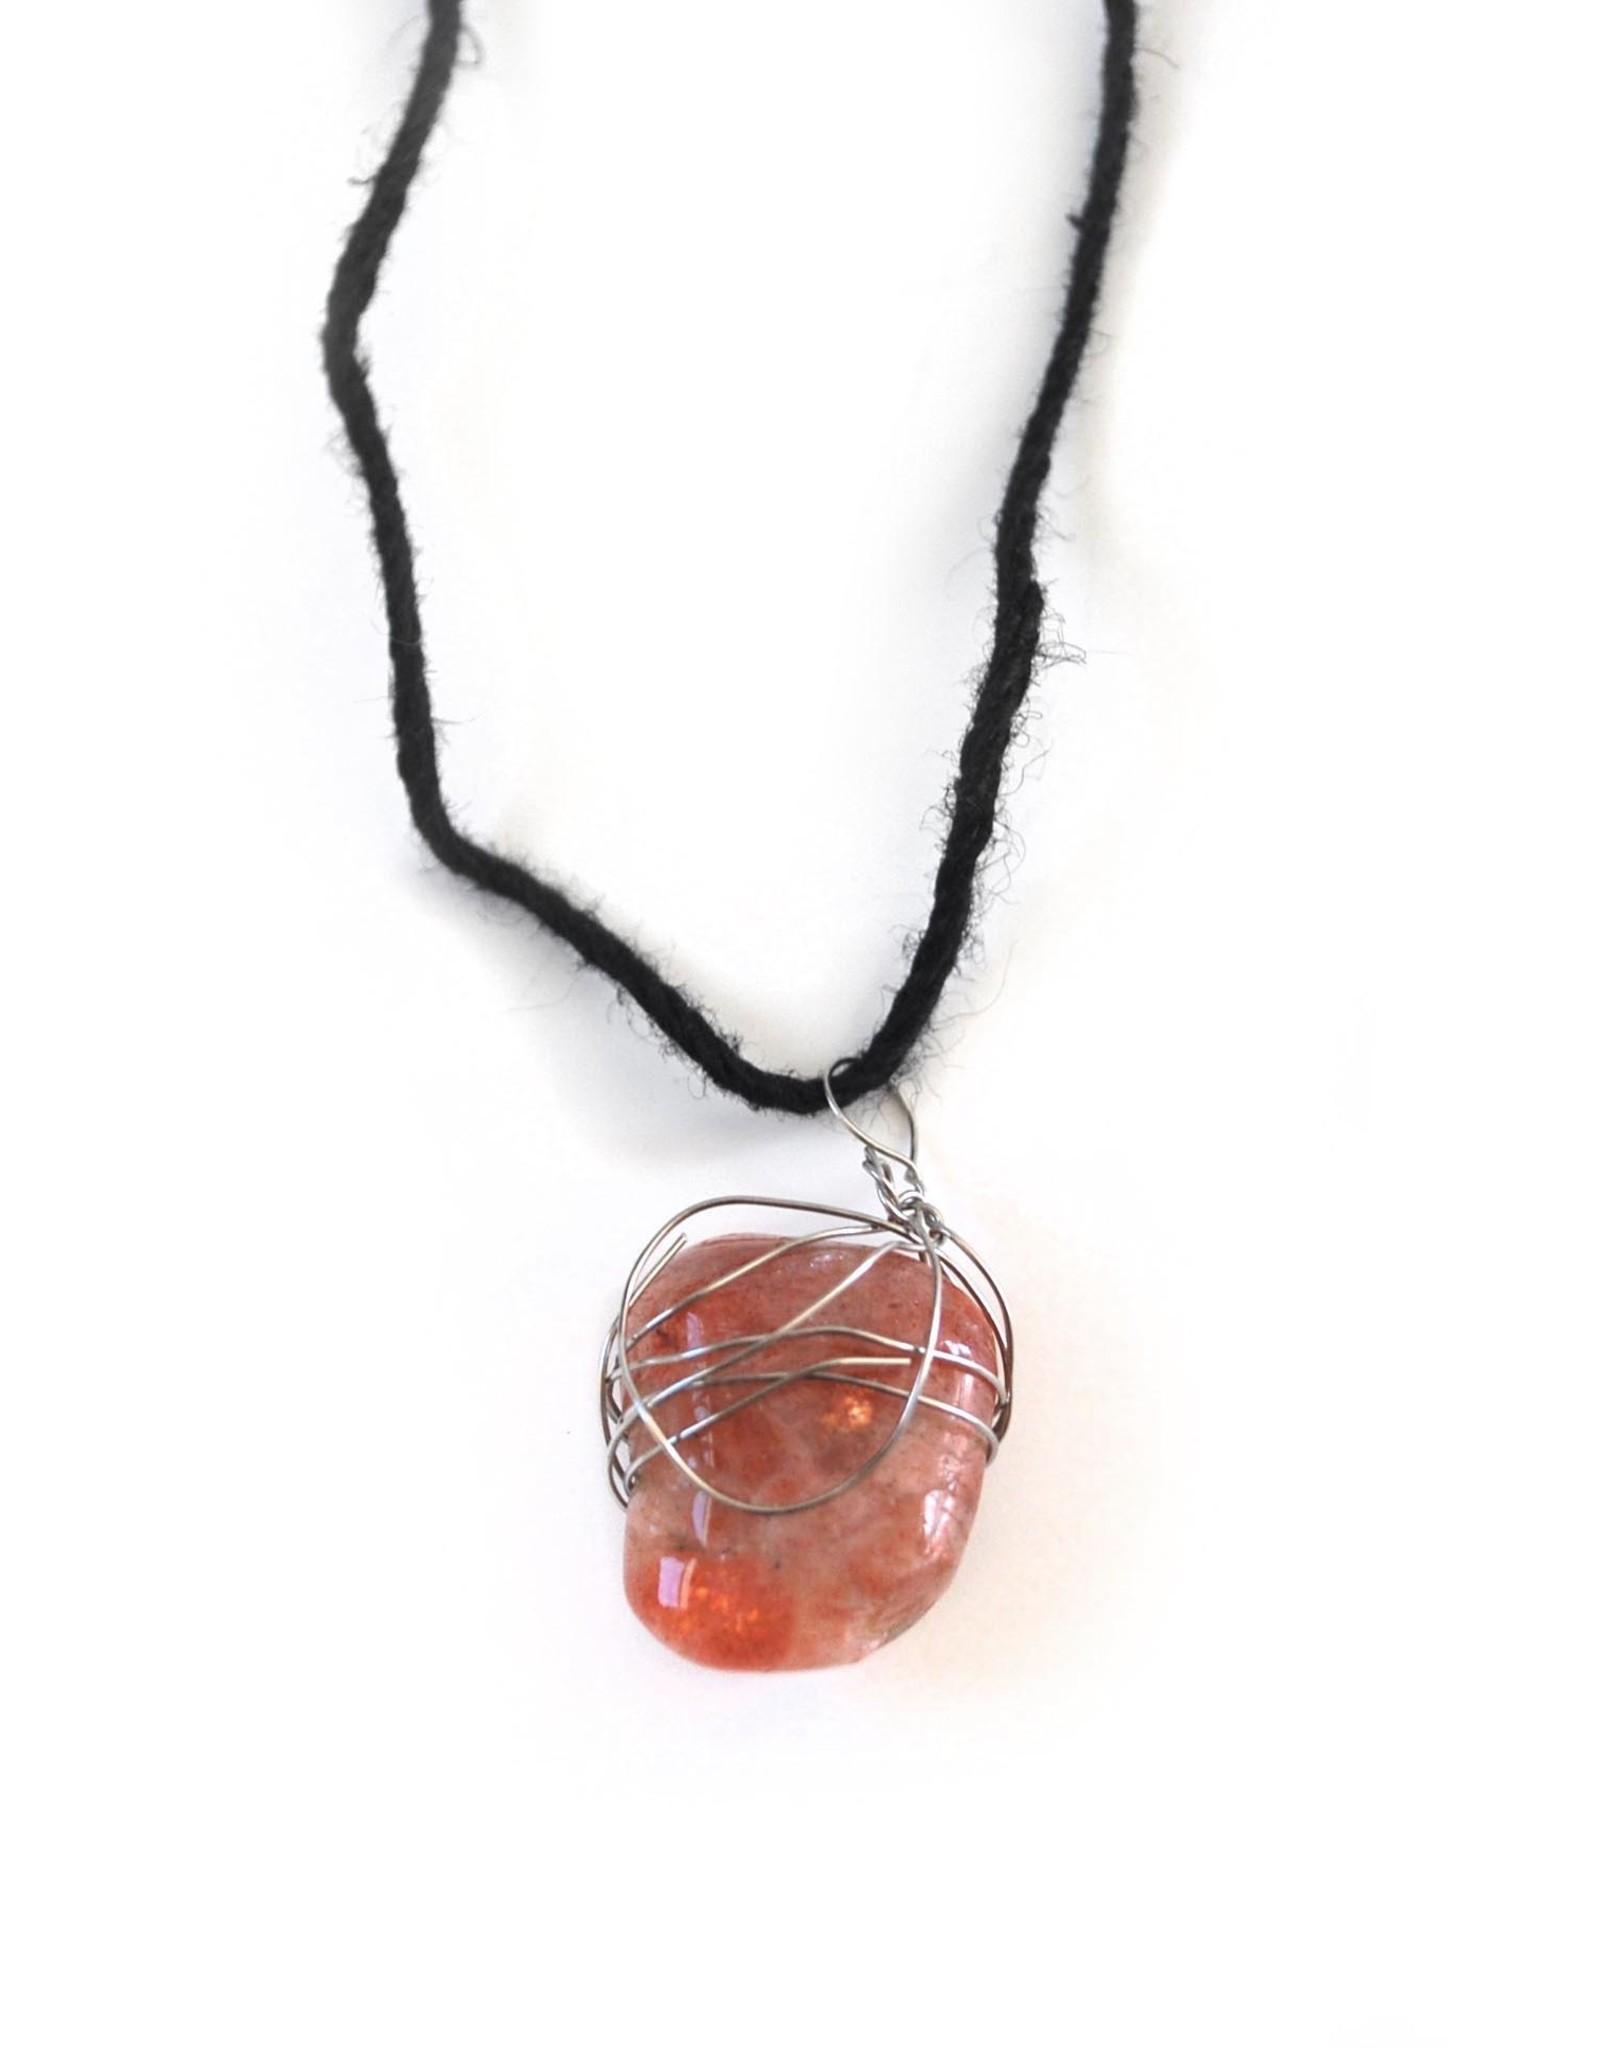 Sunstone Necklace by Mikey Tardy